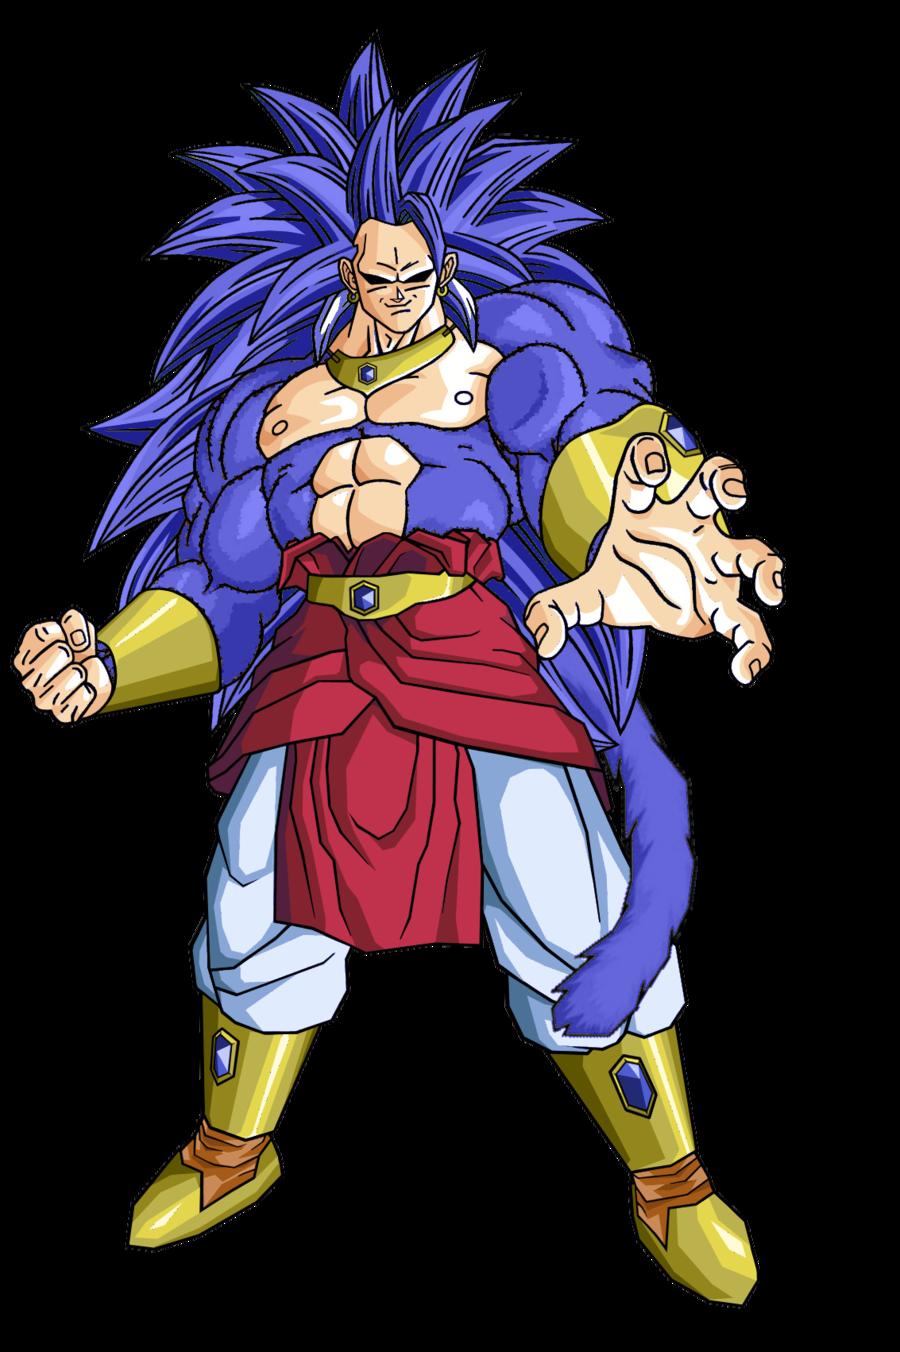 Goku lucha con broly super saiyajin legendario 7 dragon - Dragon ball z baby broly ...